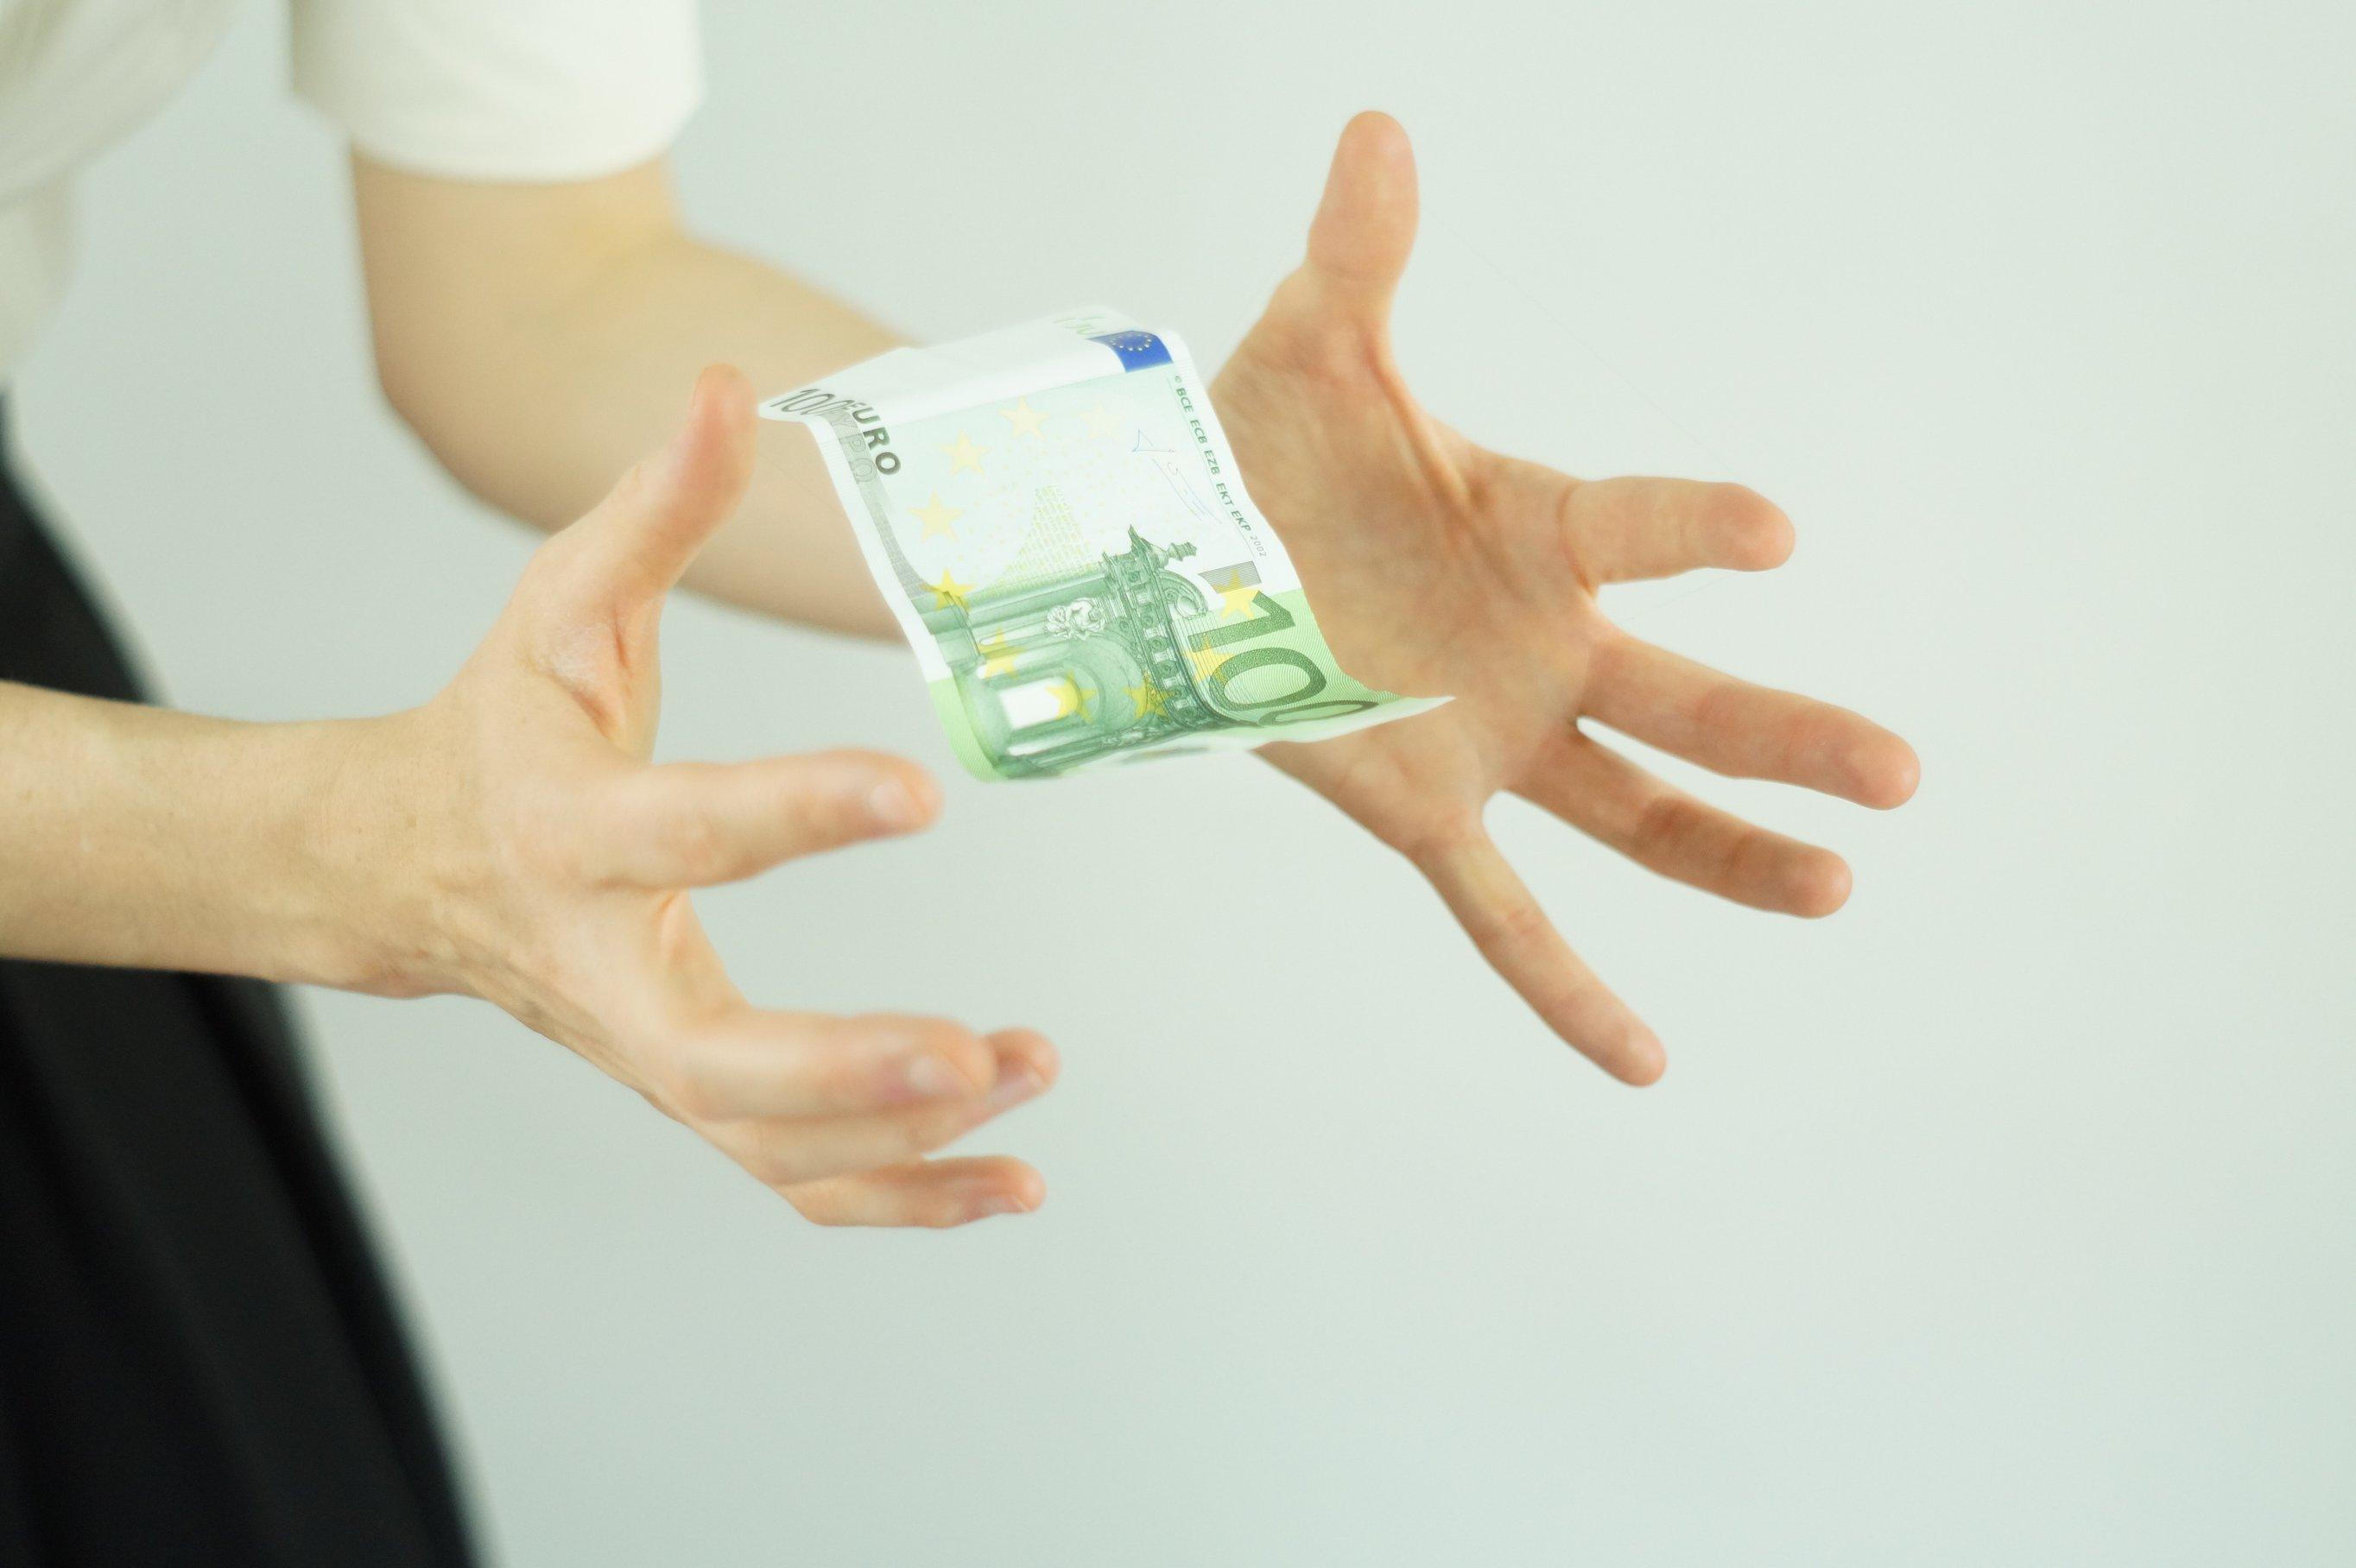 how_to_get_free_money - extra cash